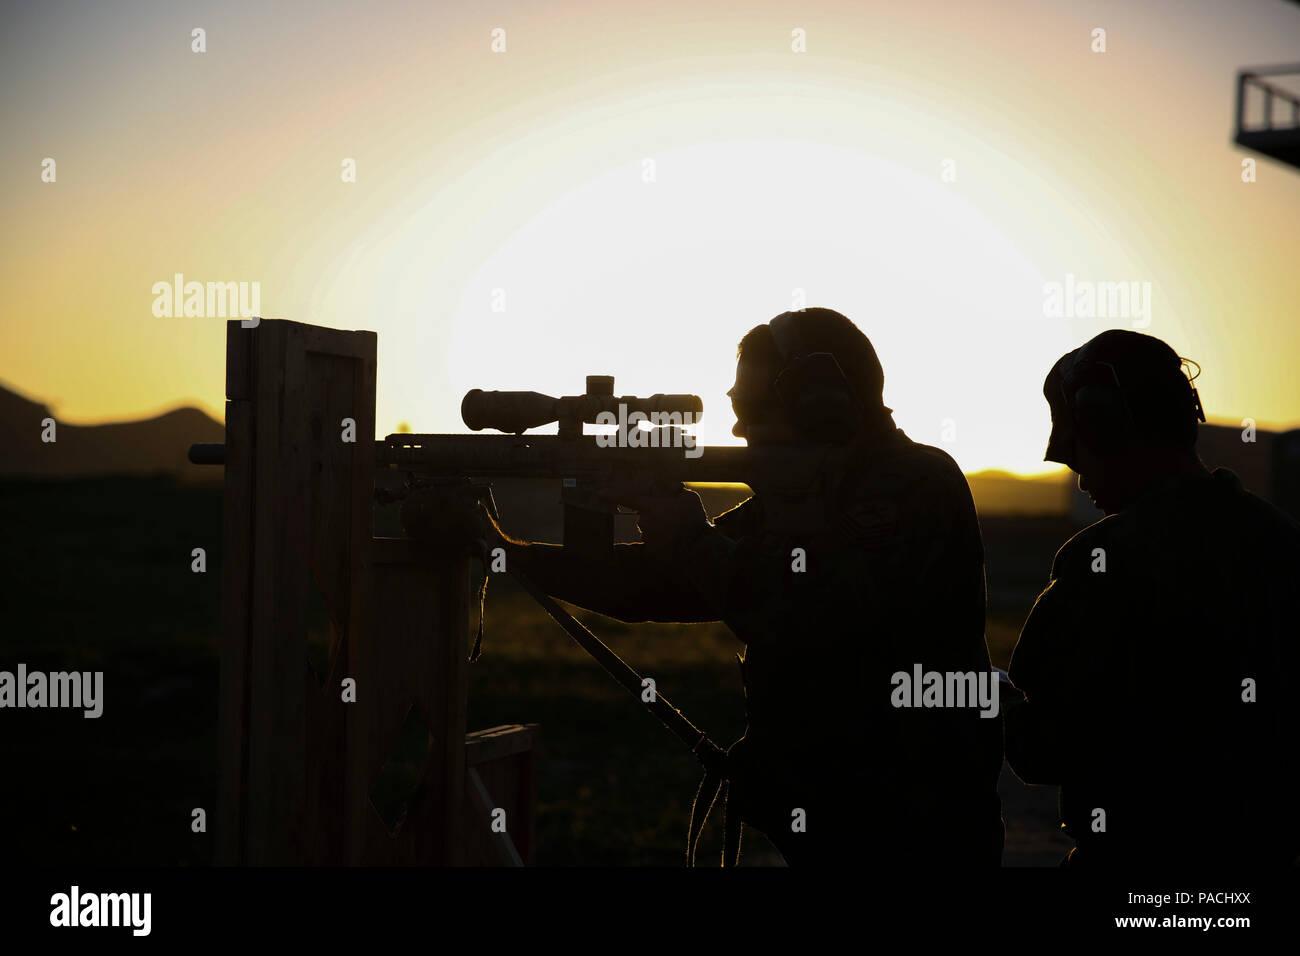 Entfernungsmesser Scharfschütze : Ein scharfschütze mit der special operations bataillon